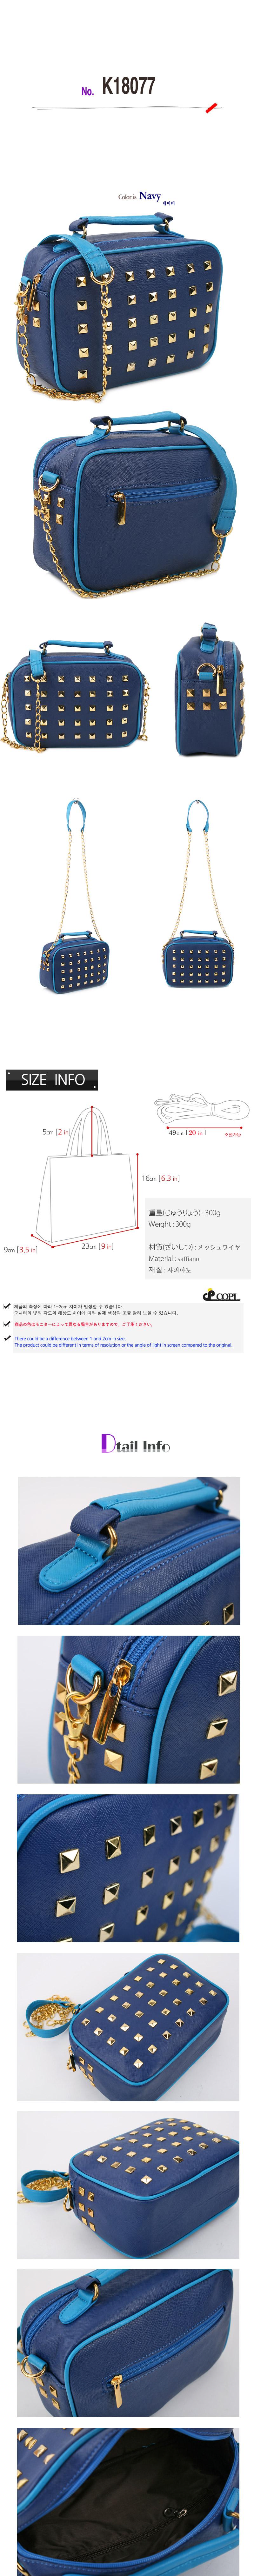 minibag no.K18077view